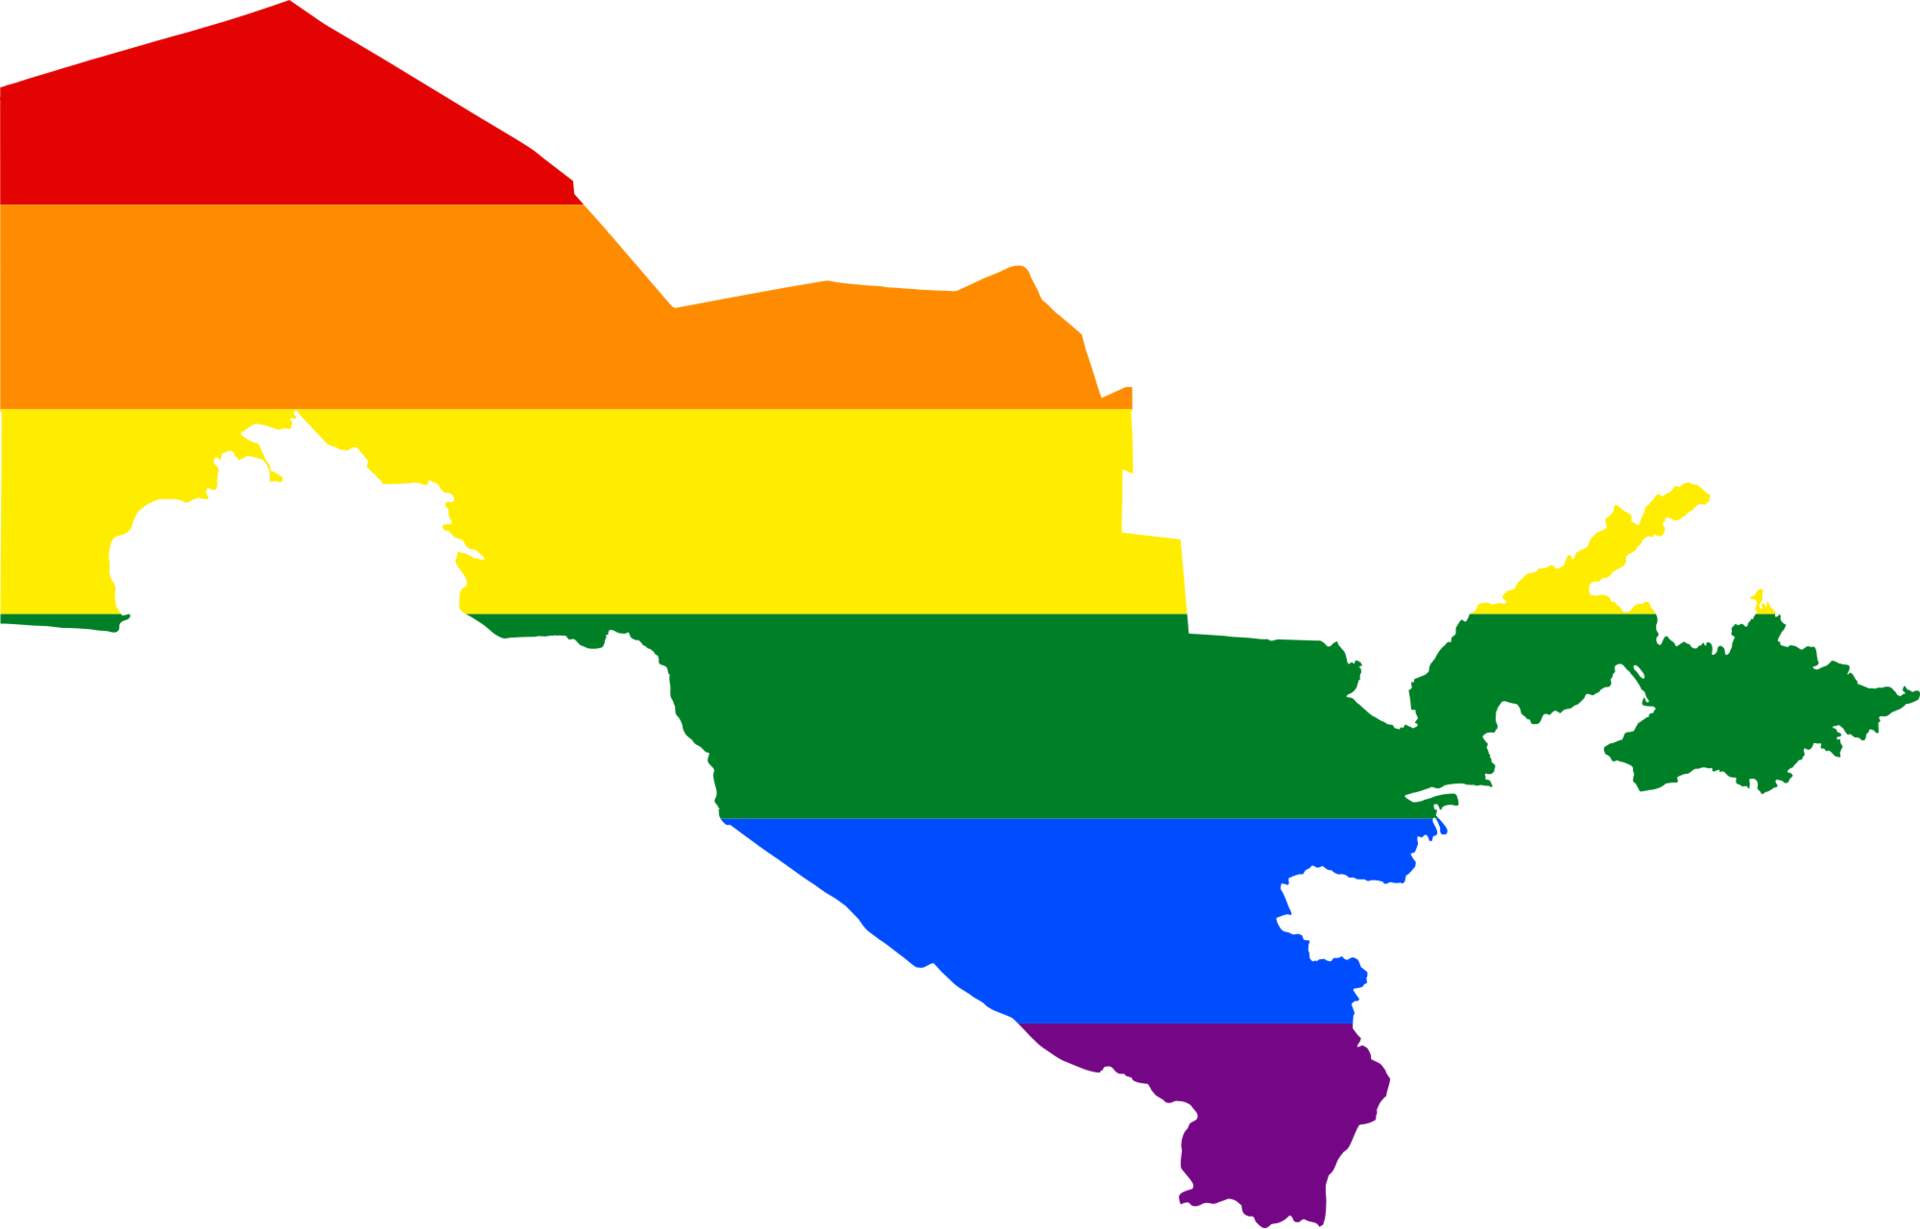 LGBT_flag_map_of_Uzbekistan.svg